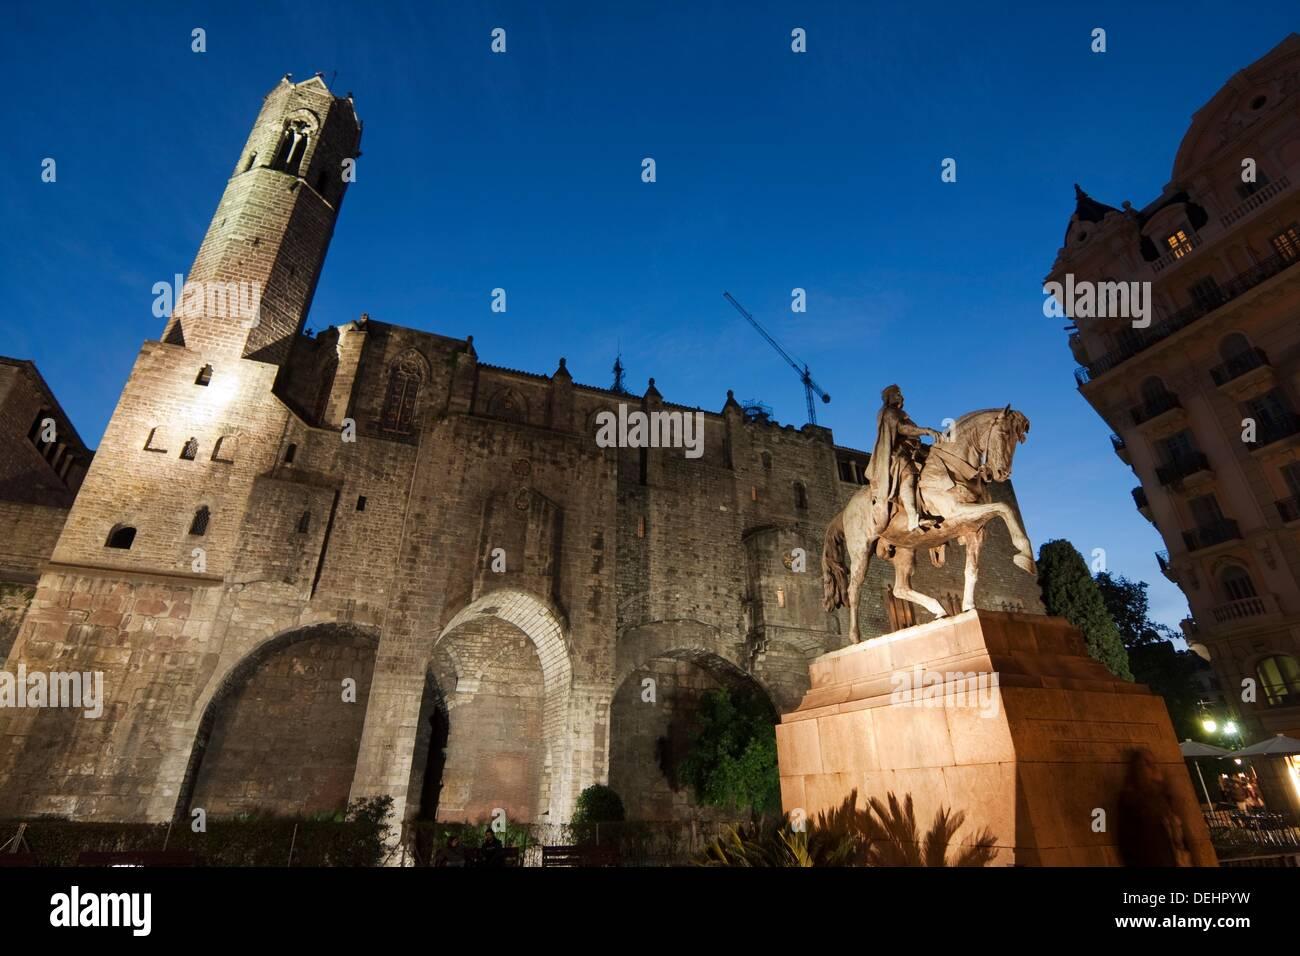 Capella de Santa Agata  Muralla romana  Estatua ecuestre de Ramon Berenguer III  España, Catalunya, Barcelona - Stock Image